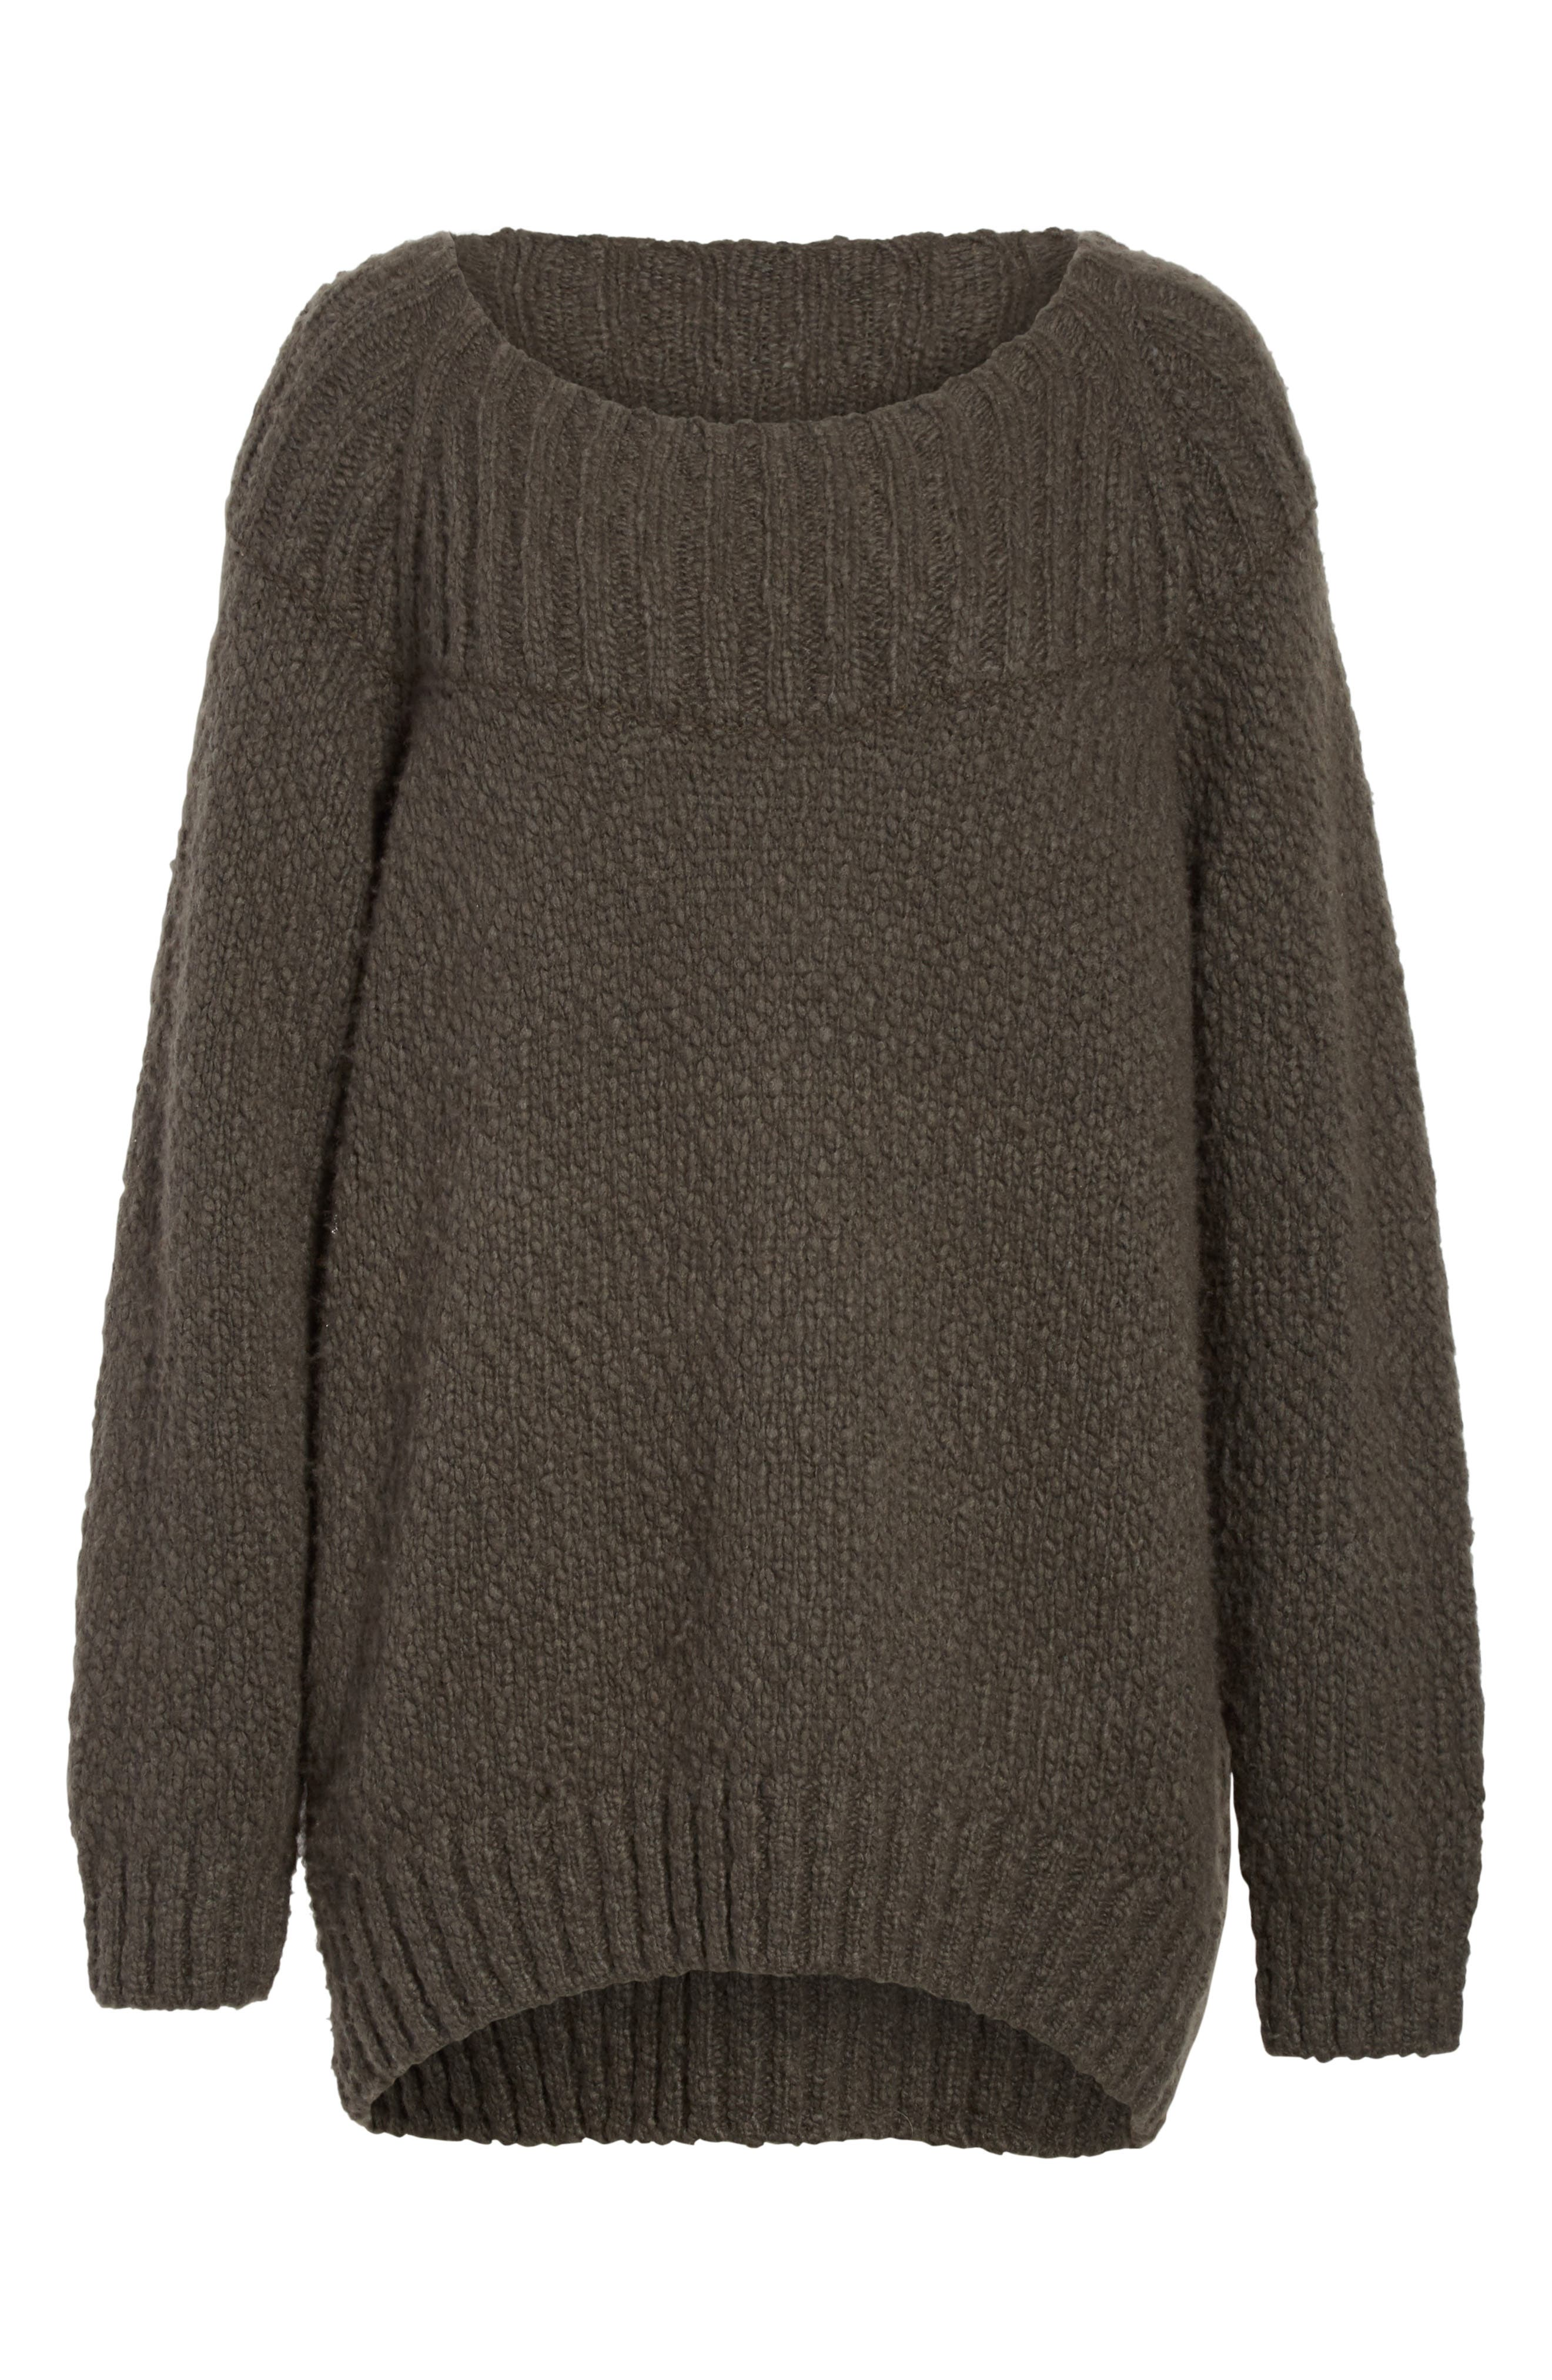 Ribbed Yoke Knit Sweater,                             Alternate thumbnail 6, color,                             082